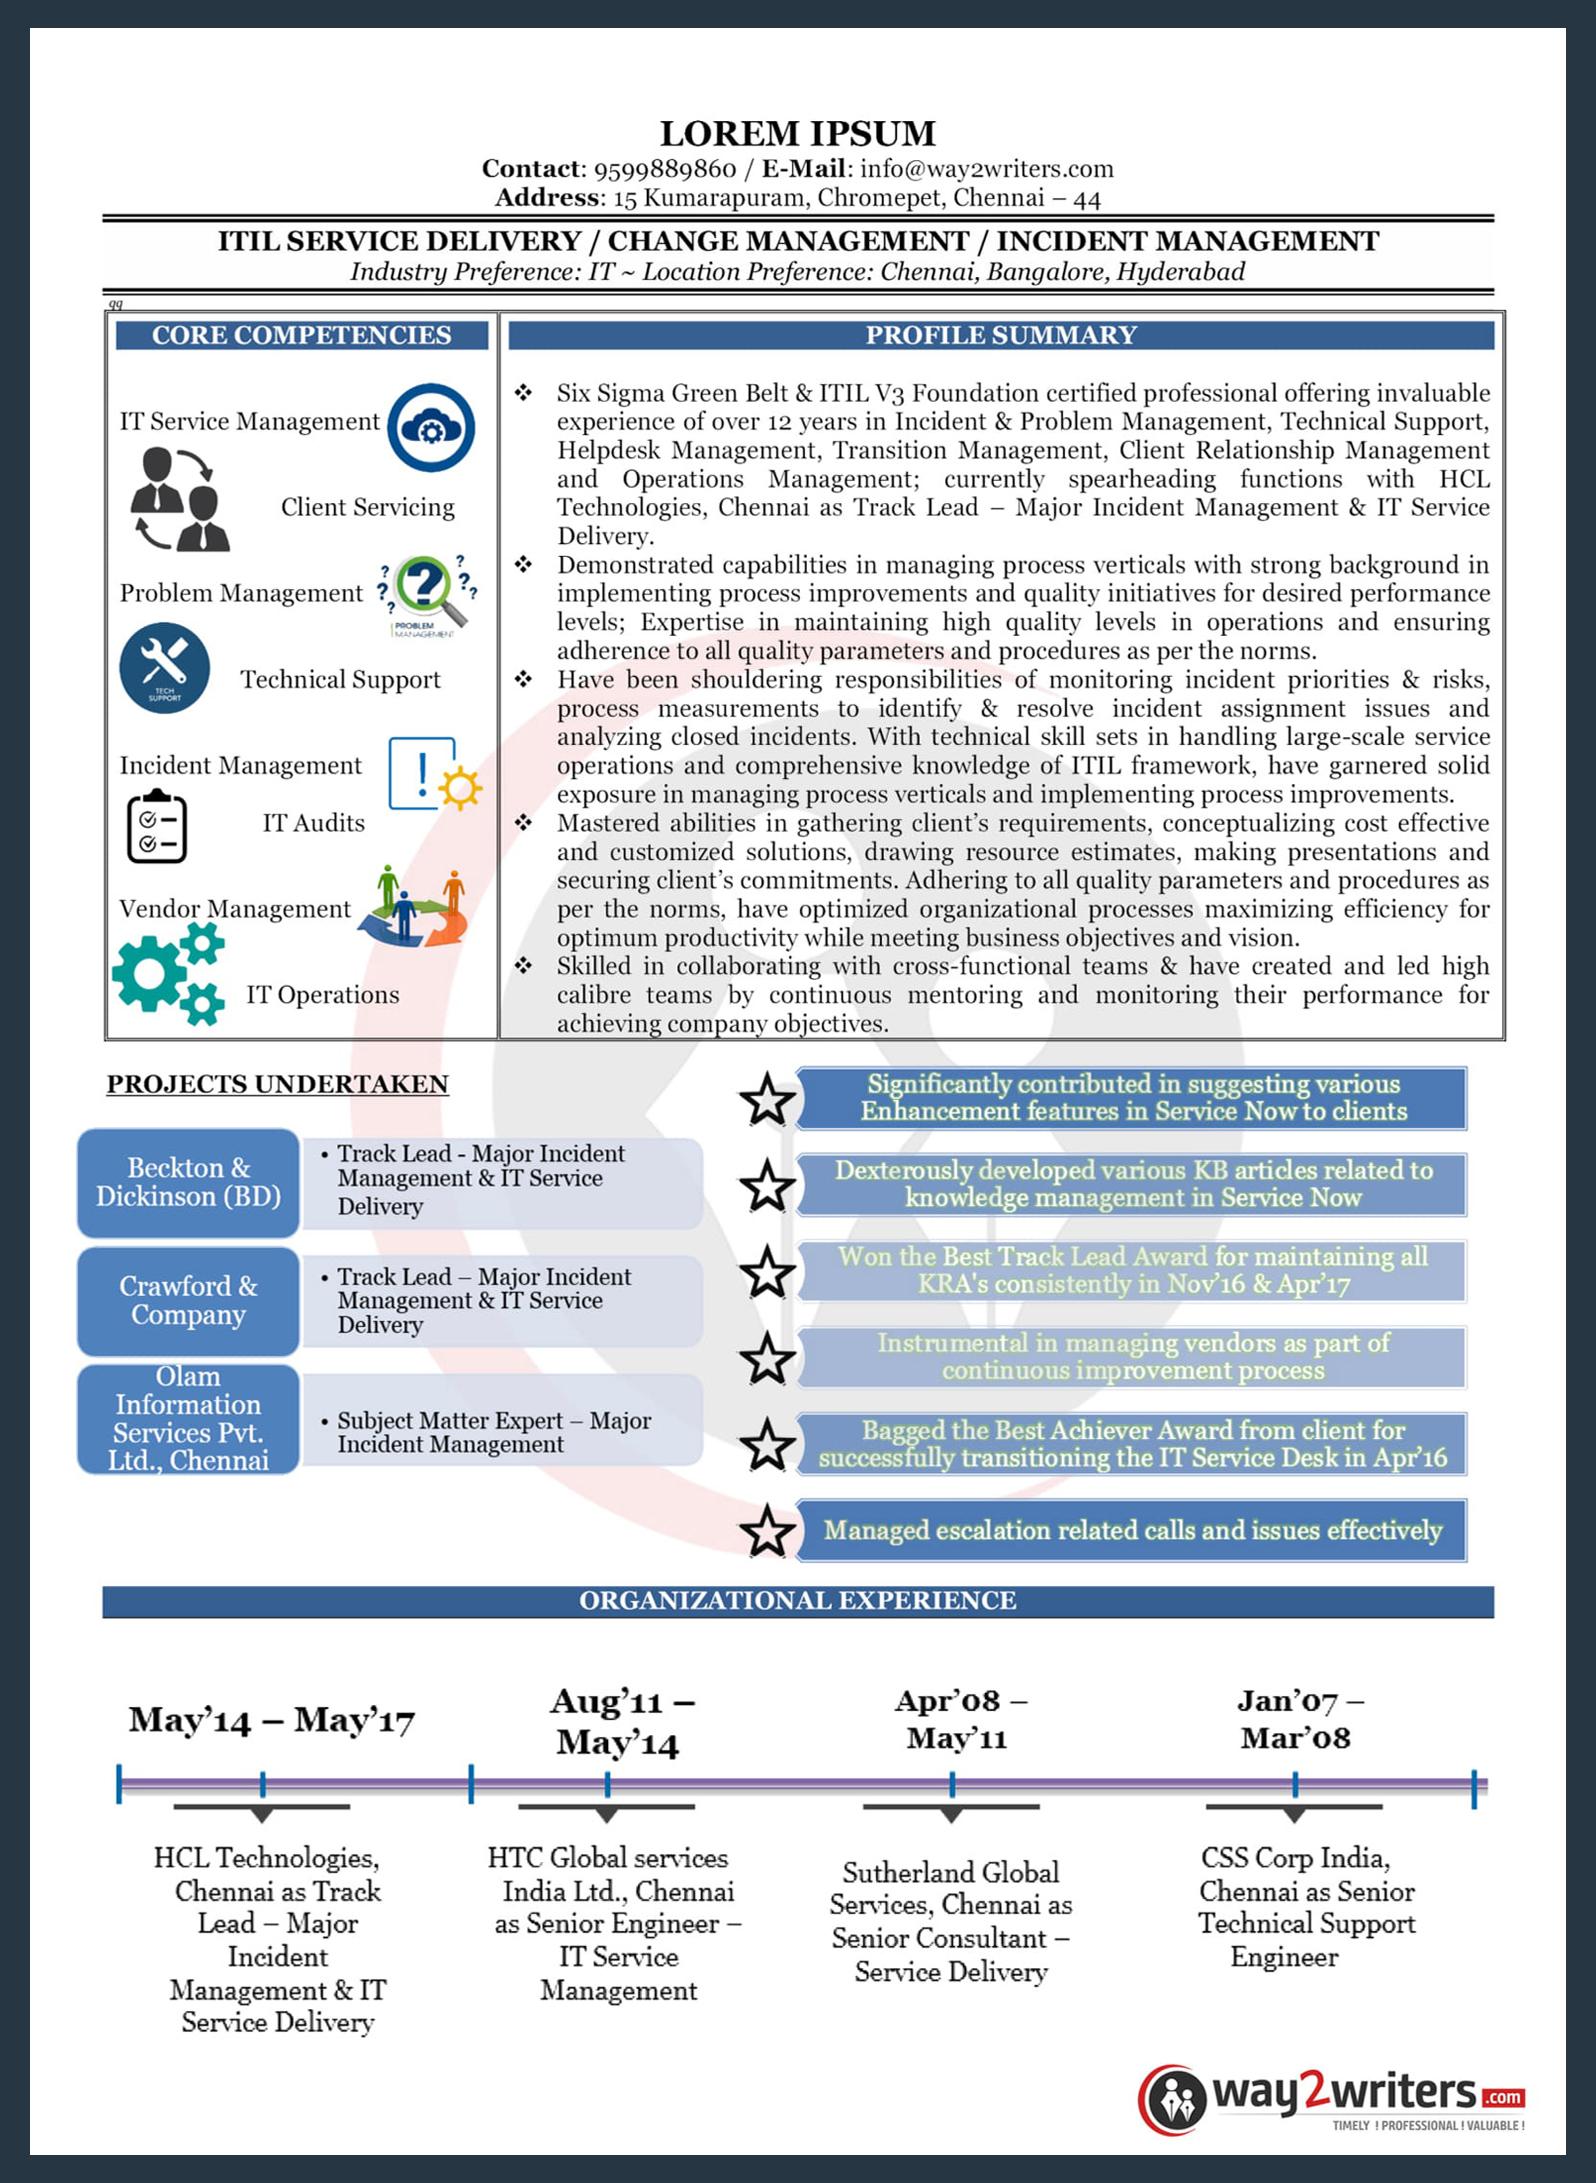 resume writing Services,international resume writing company